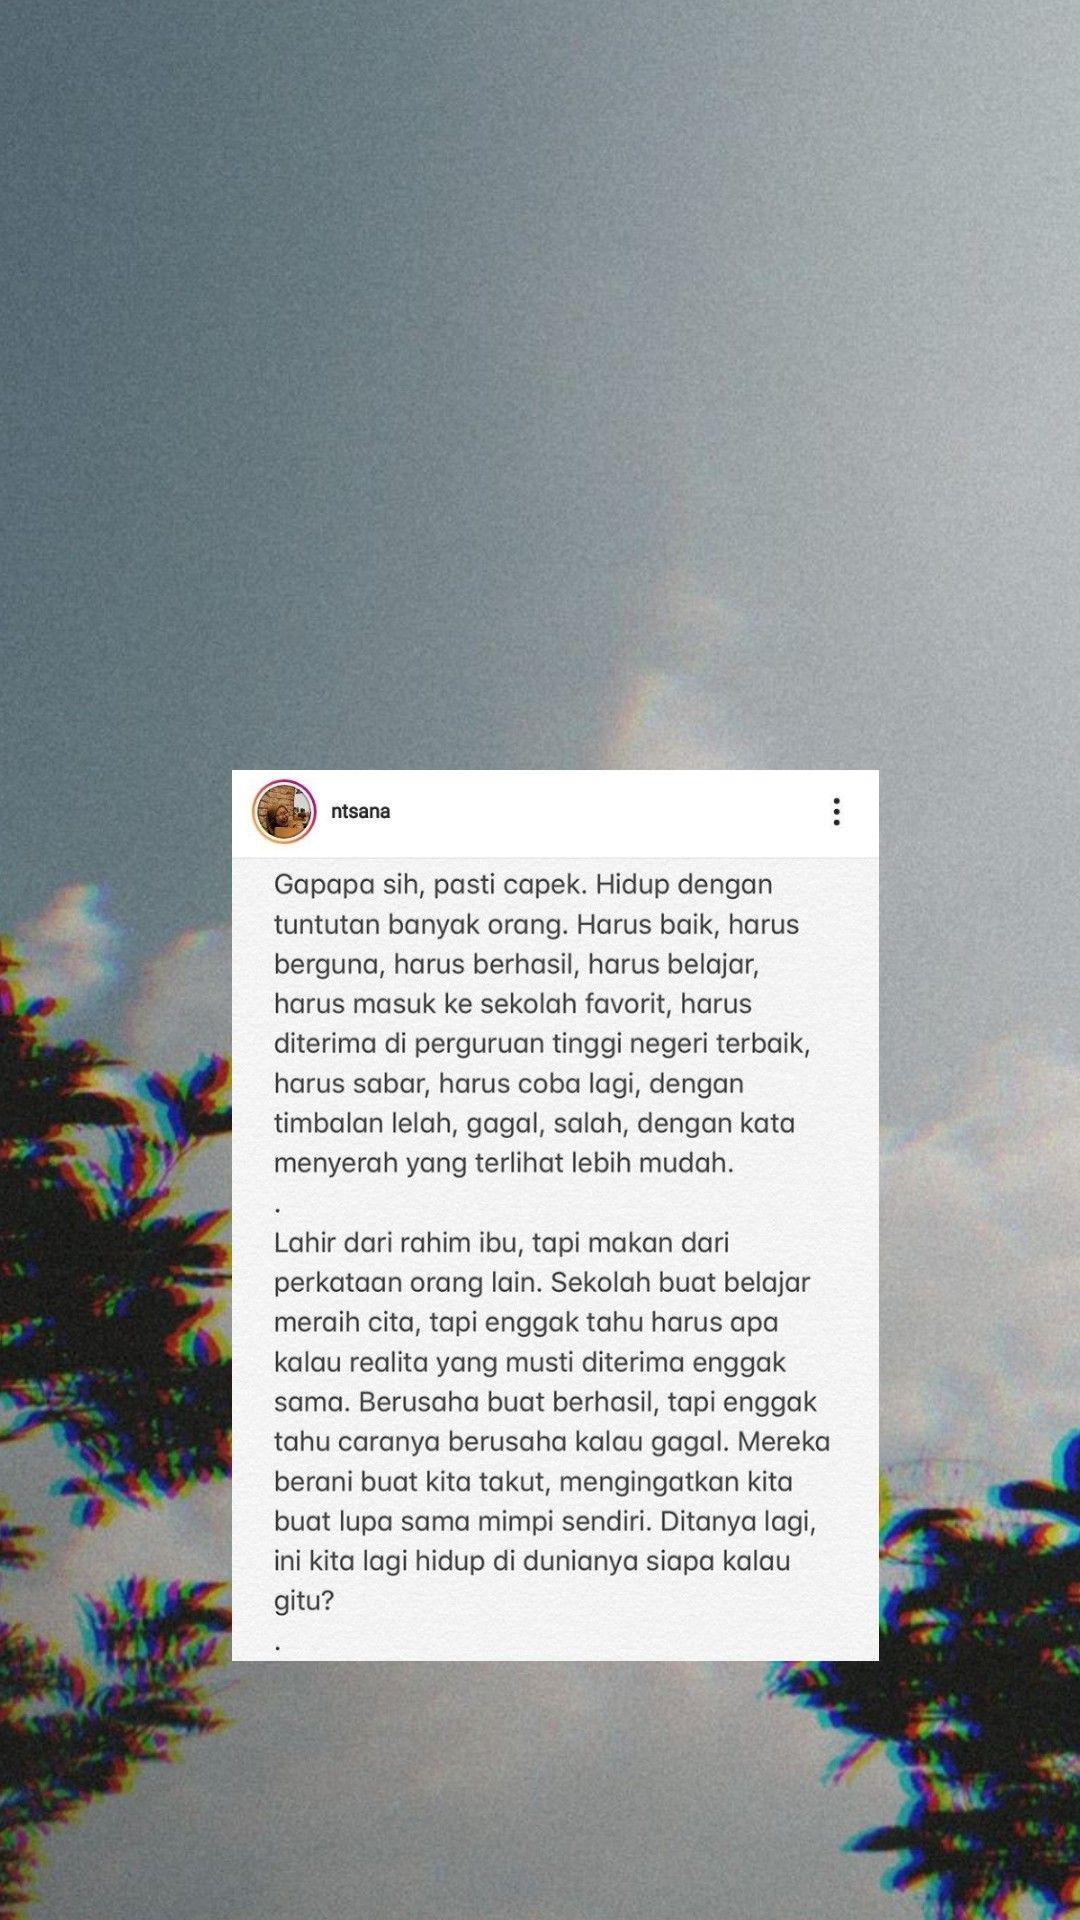 Pin Oleh Aisyah Alifia Di Kutipan 2020 Kata Kata Indah